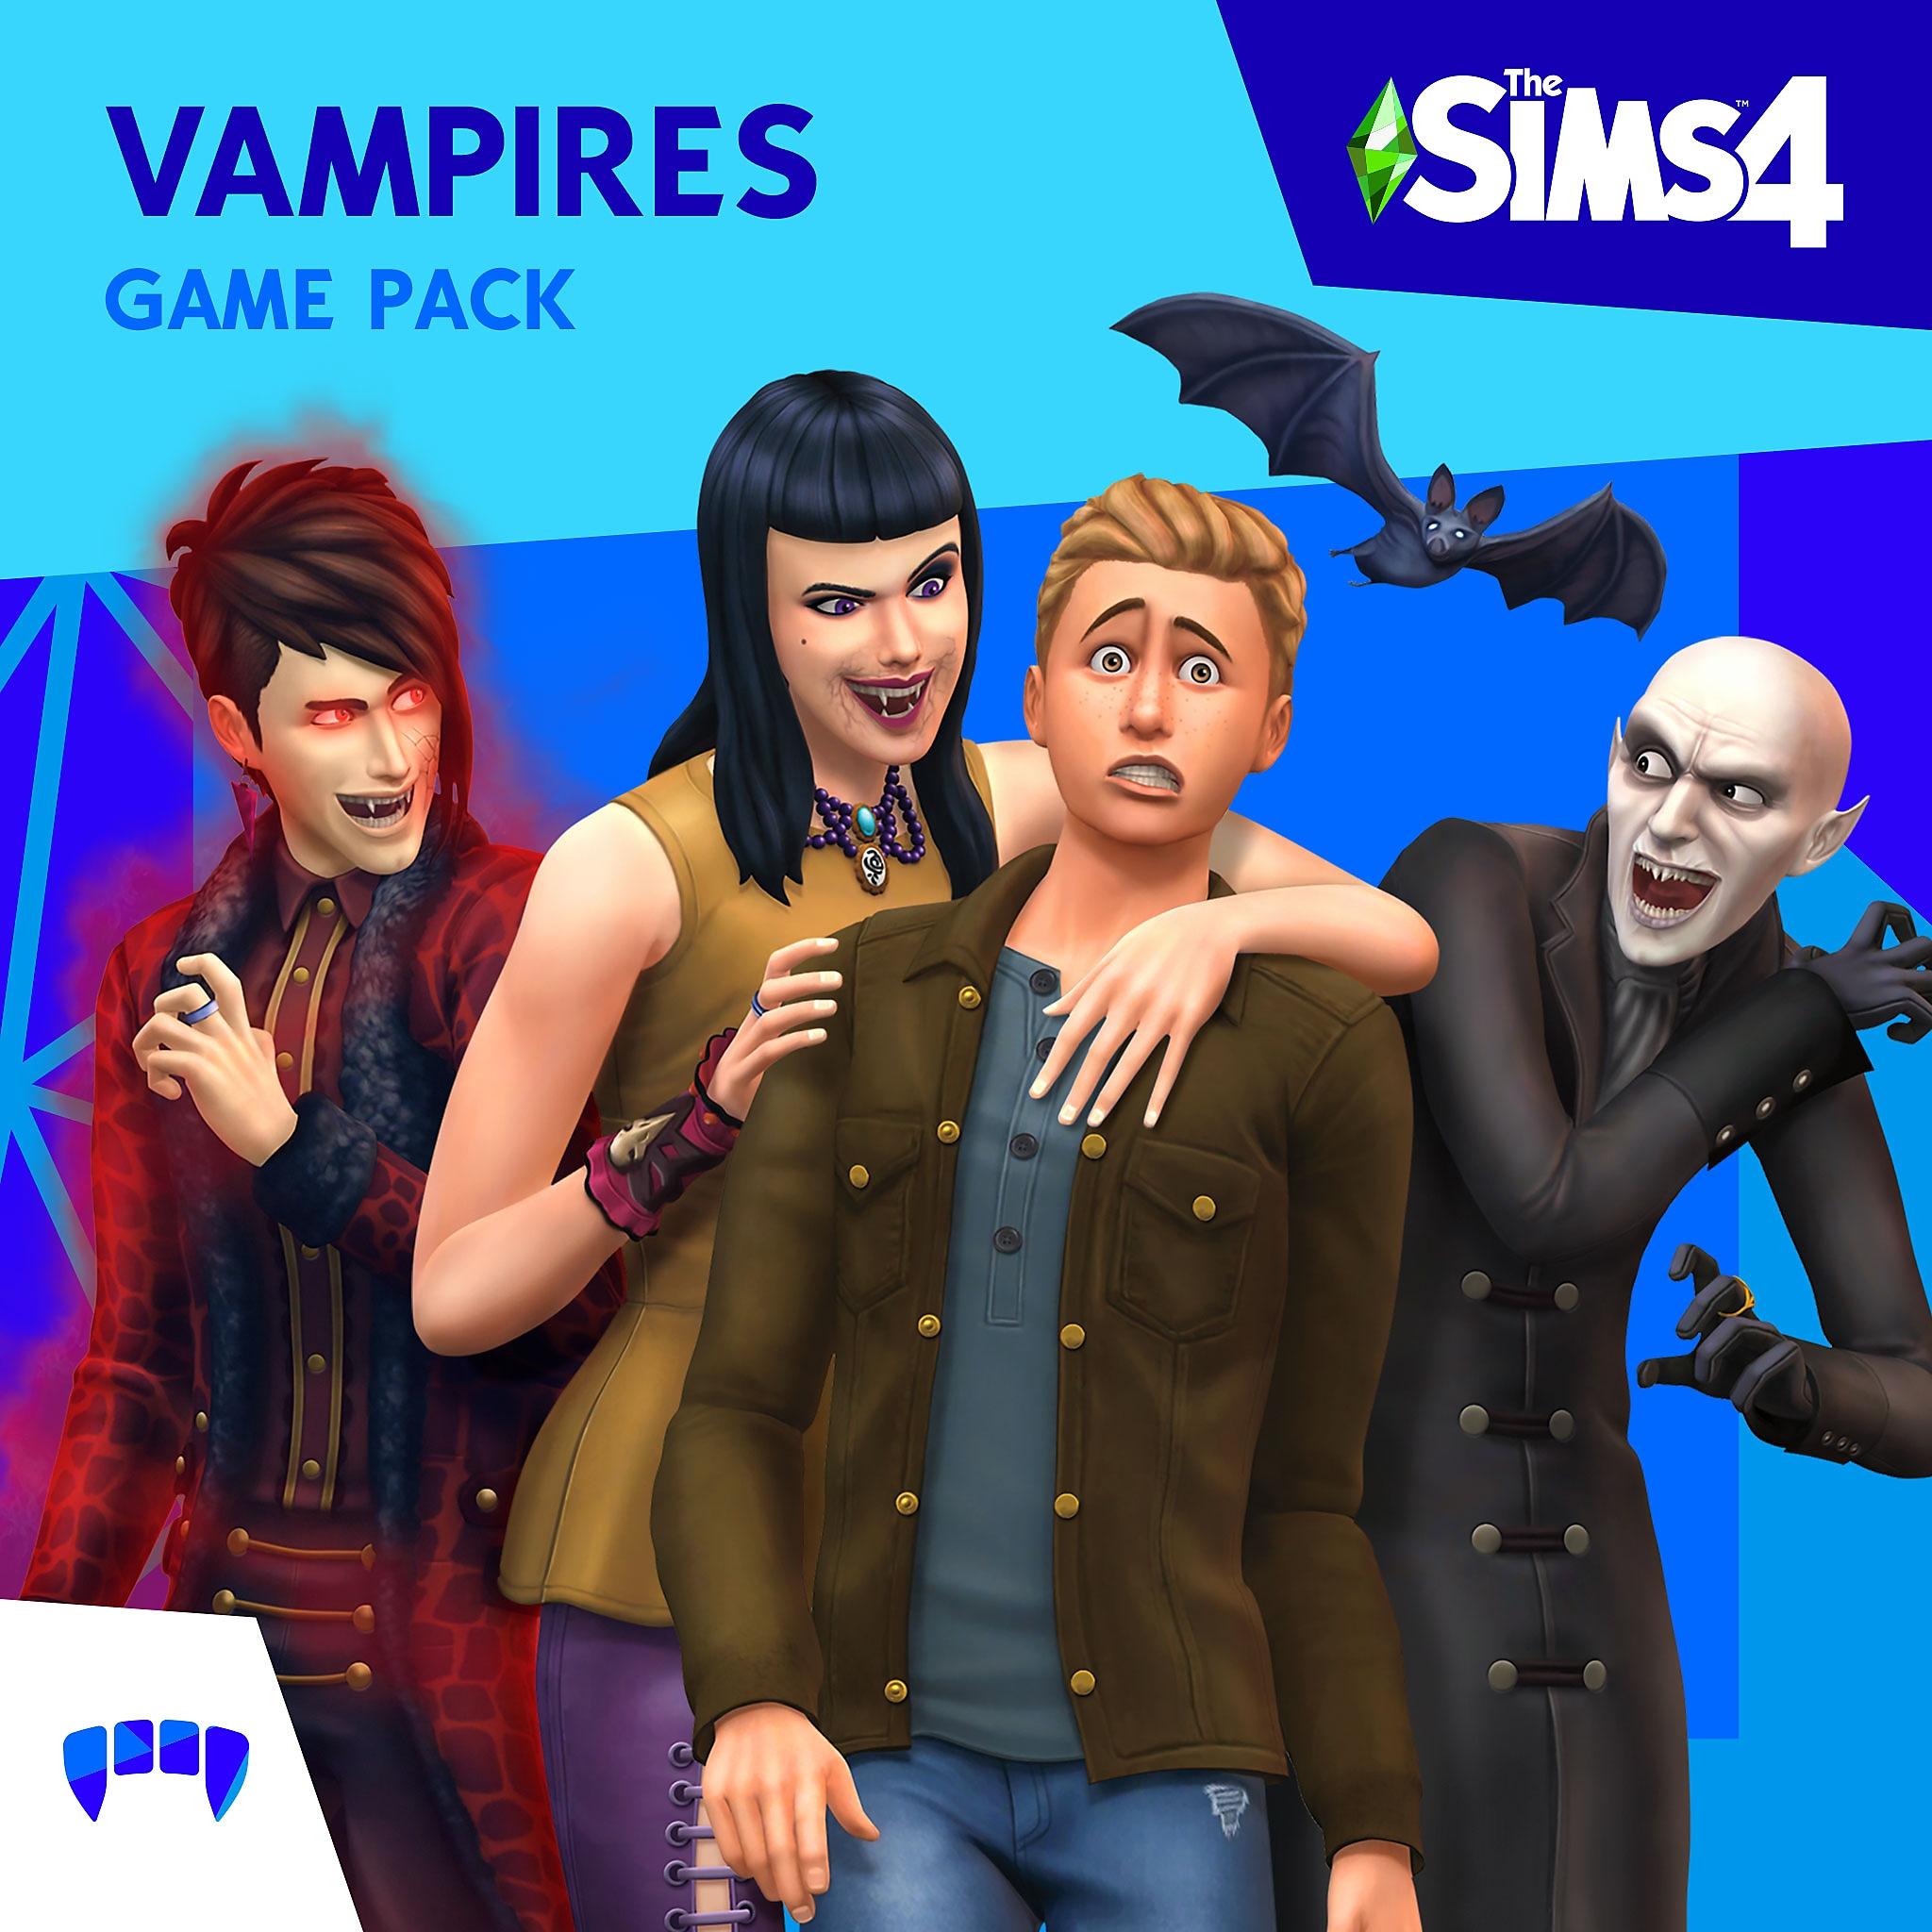 Vampires Game Pack